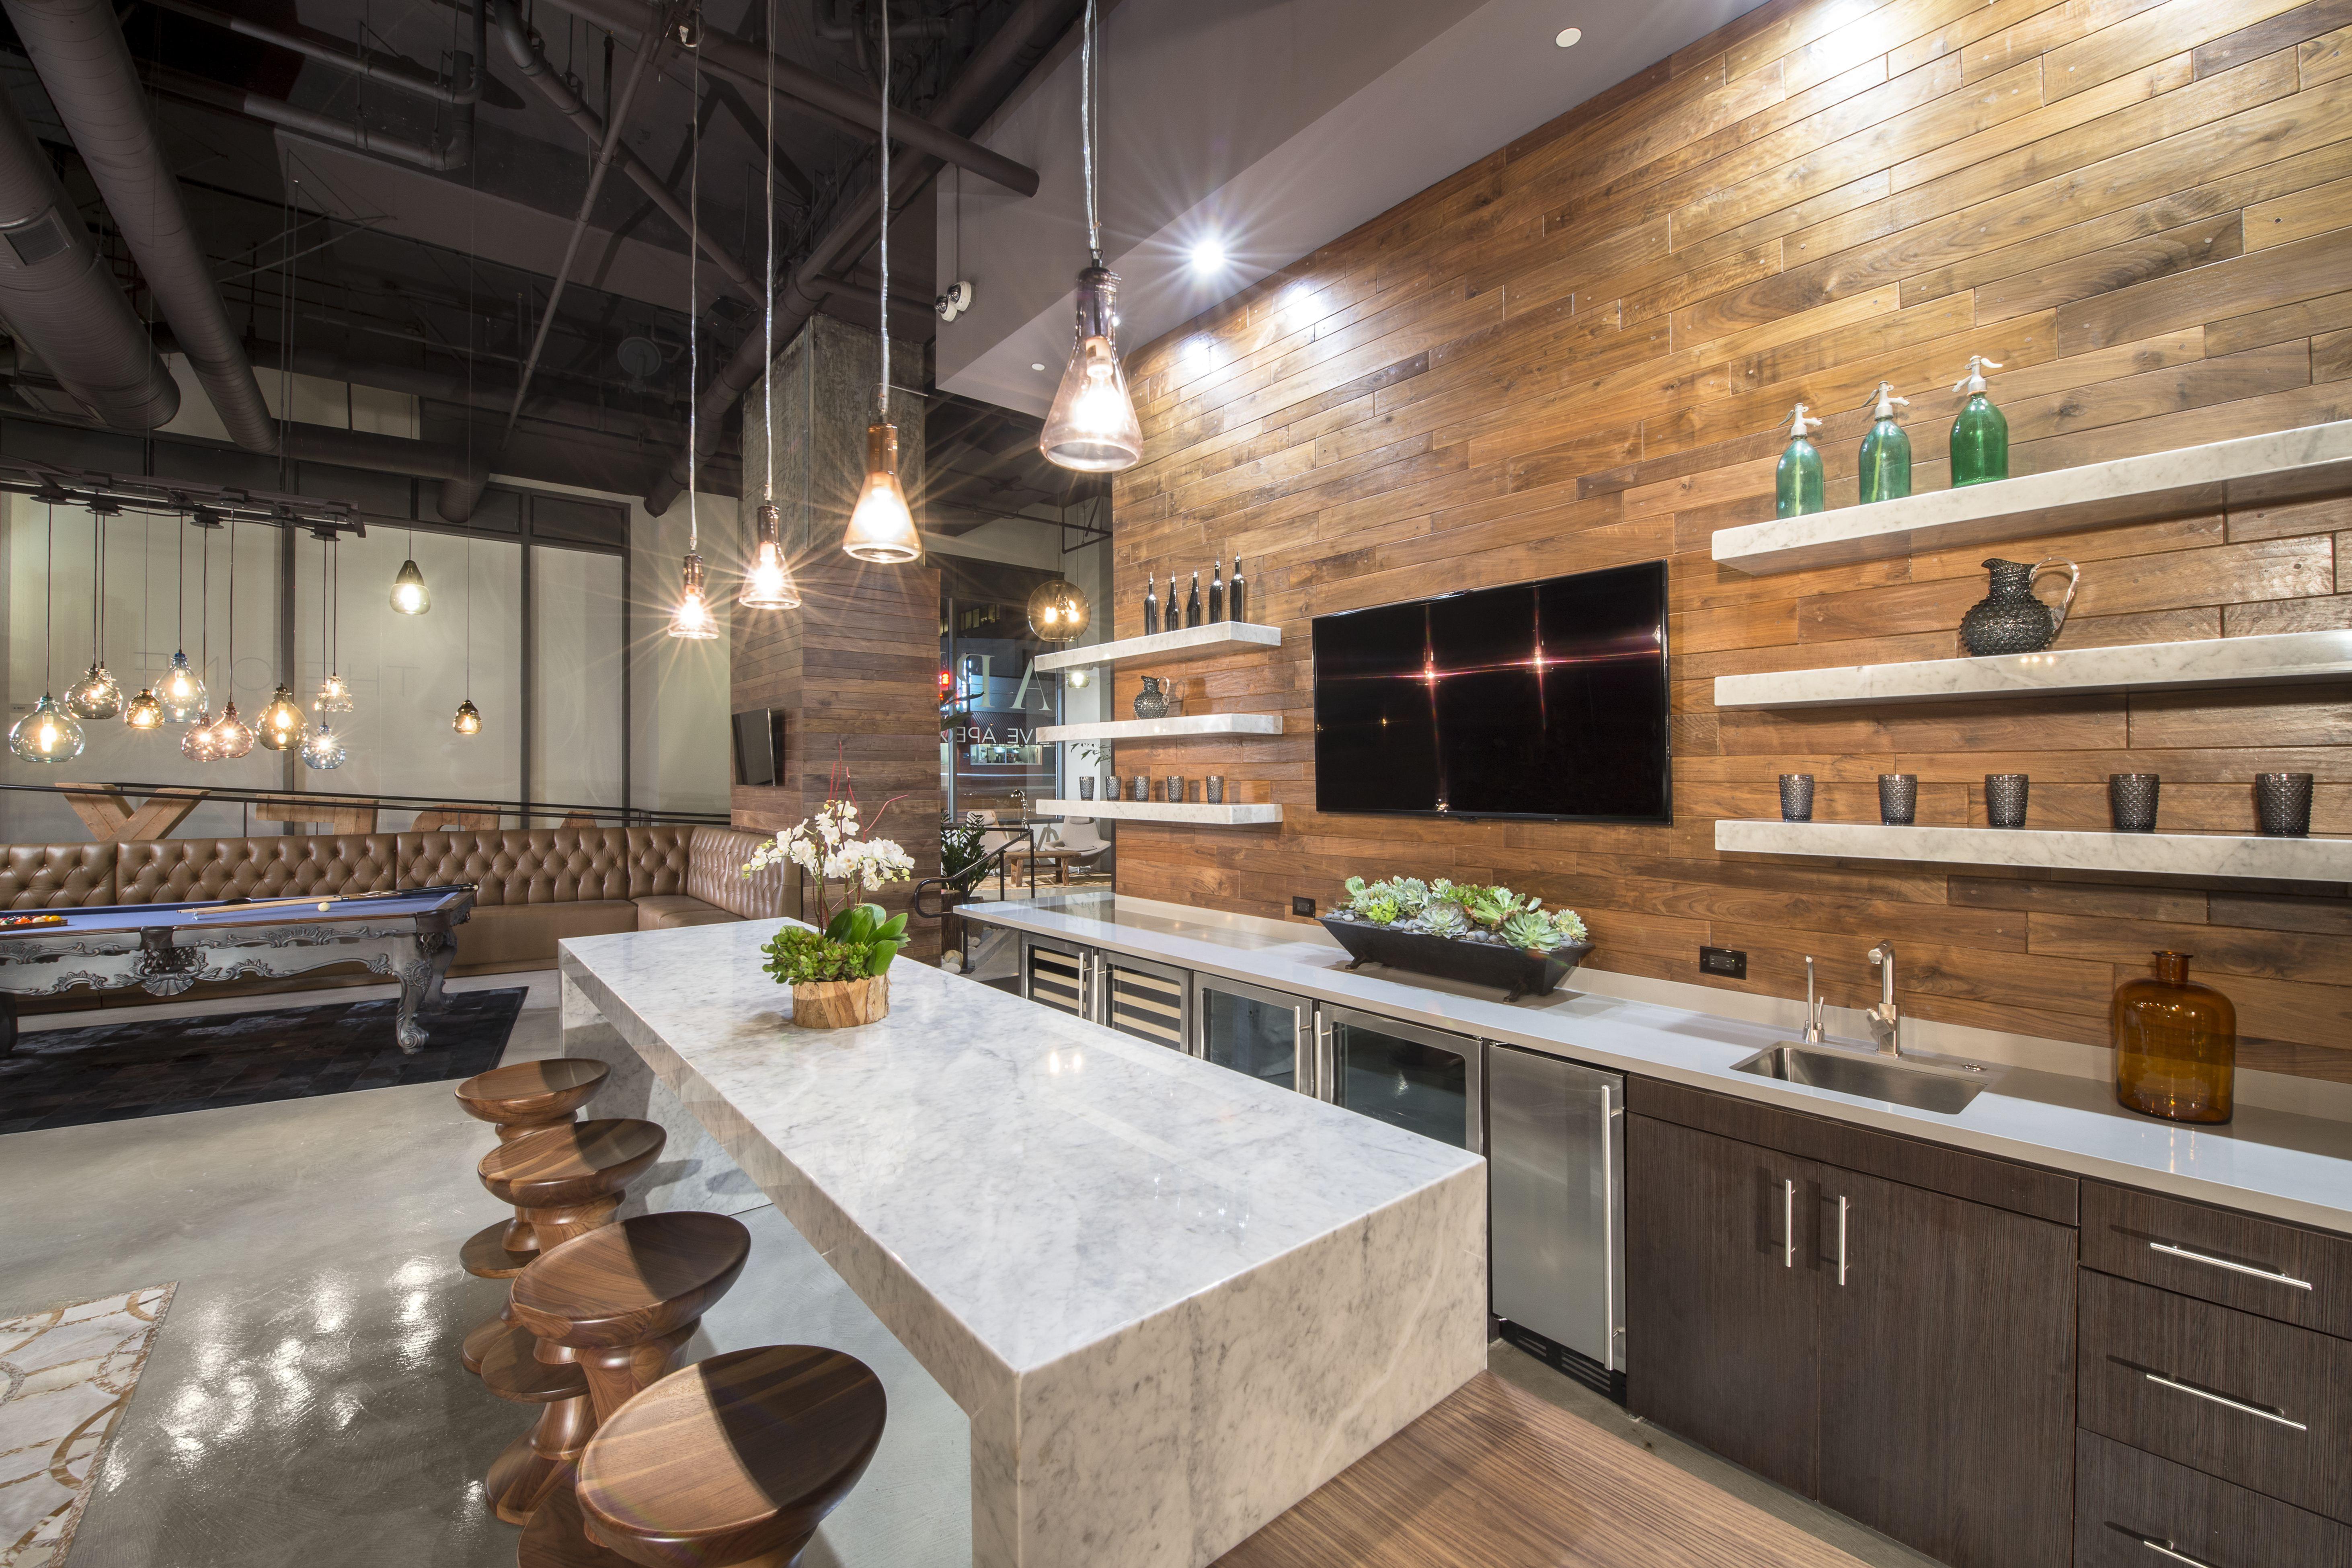 Lovable Modern Kitchen Decors With Wood Backsplash Also White